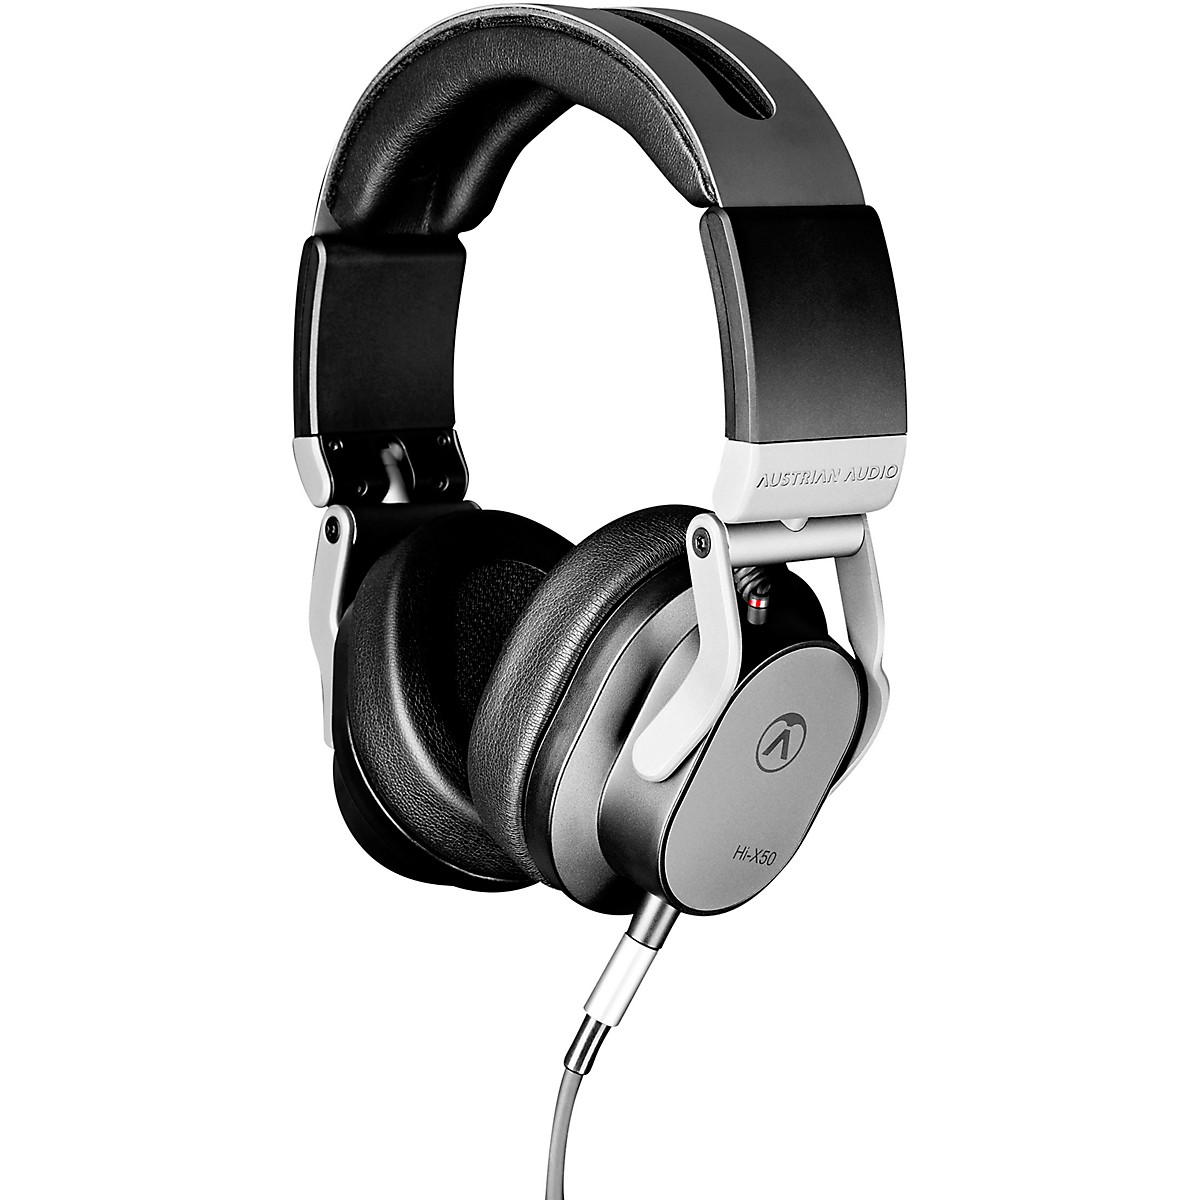 Austrian Audio Hi-X50 Professional Closed-back On-ear Headphones